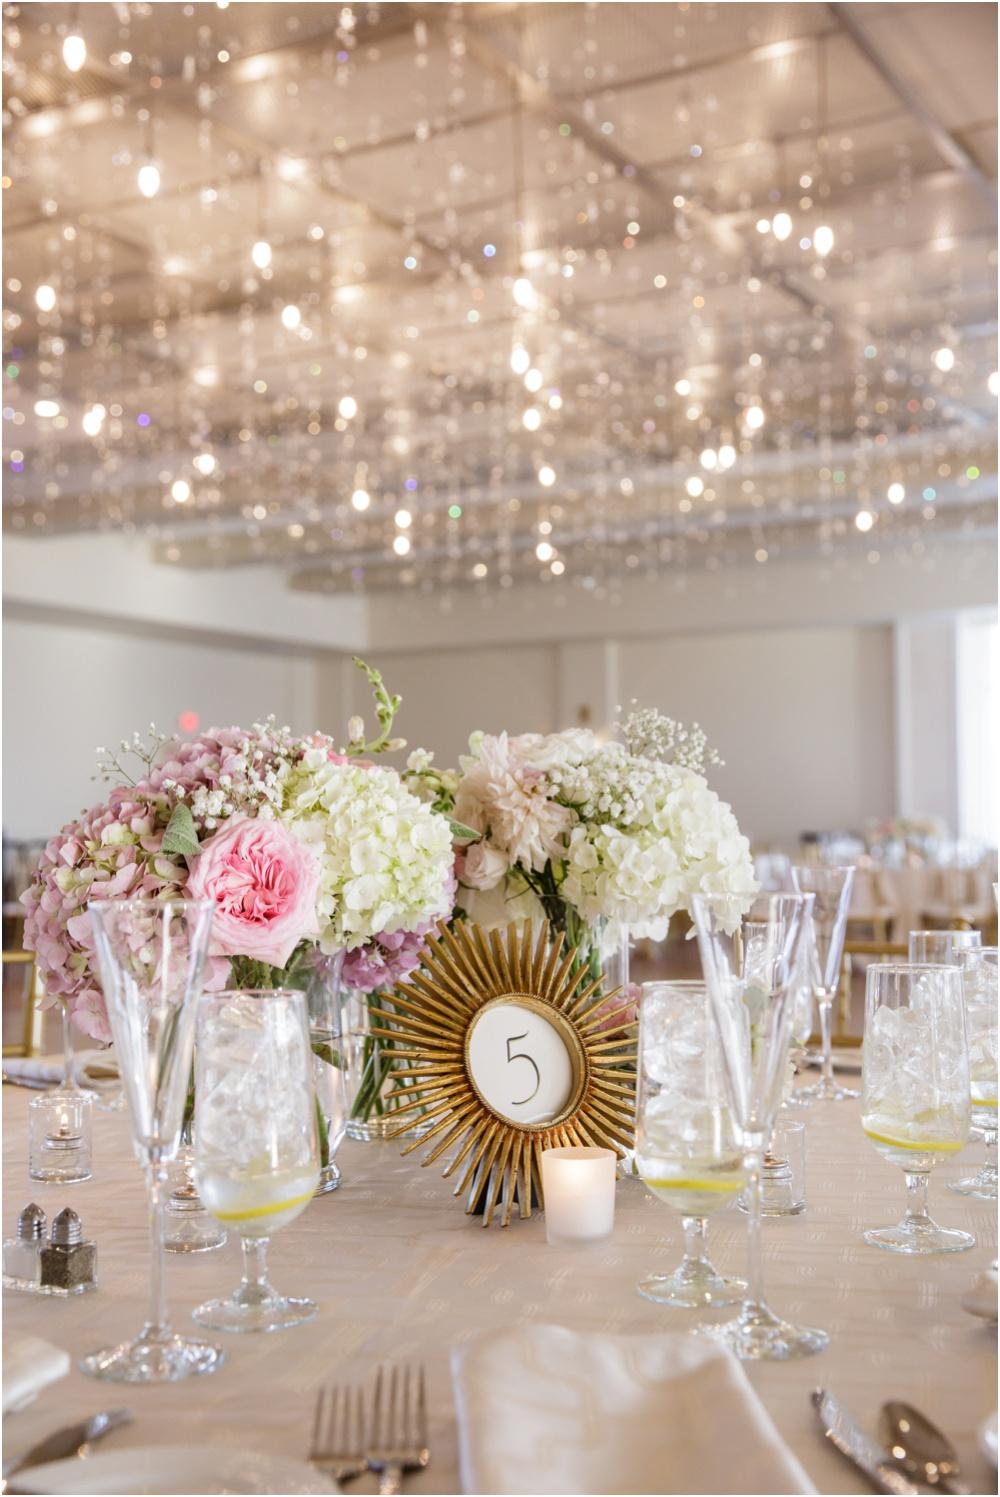 RI-Wedding-Photographer-Lefebvre-Photo-Blog_3290.jpg